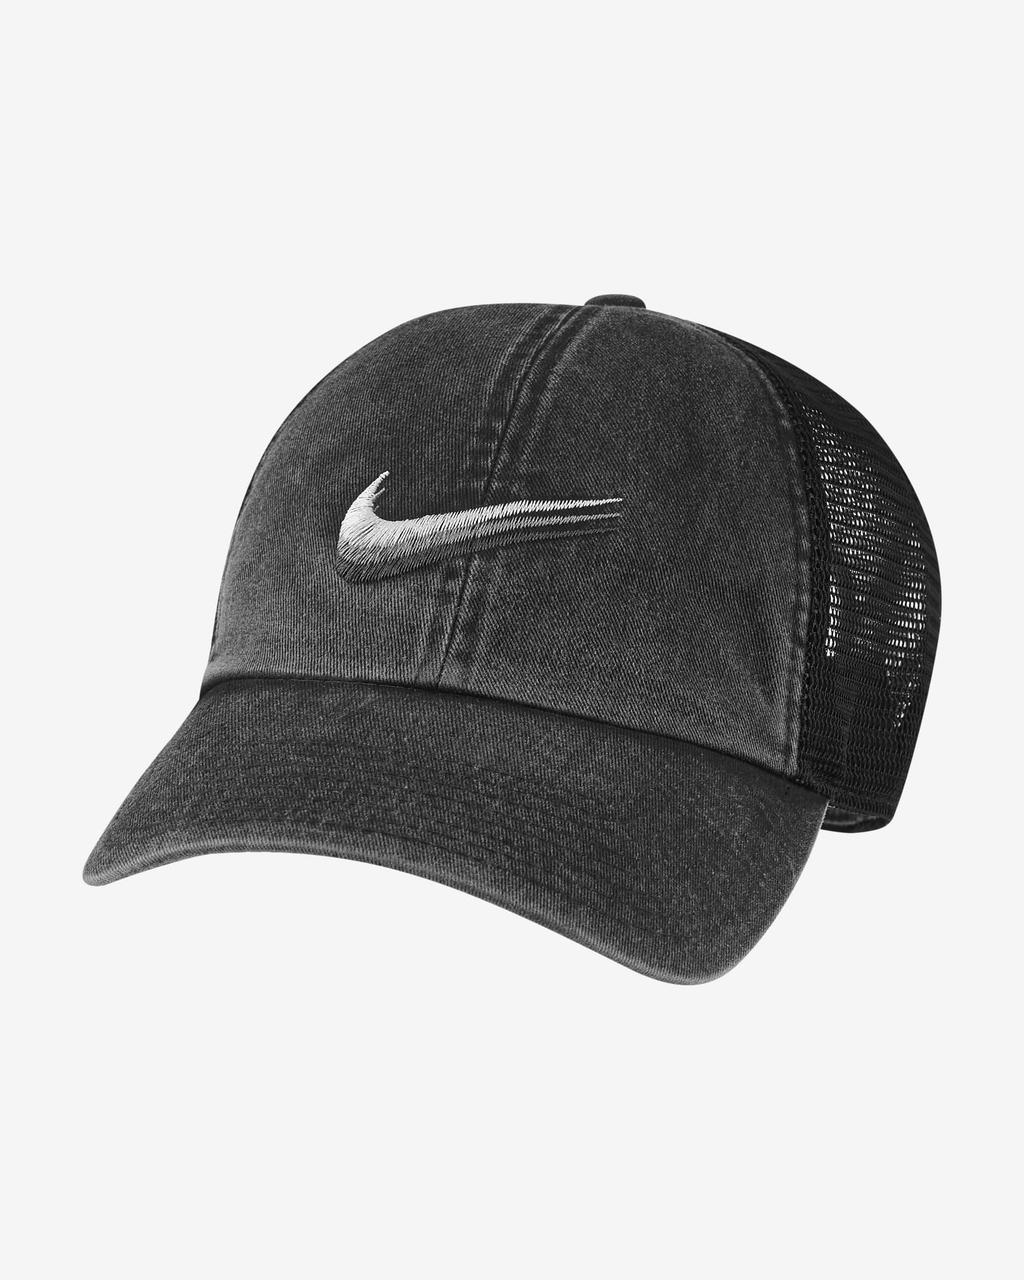 Кепка мужская Nike Sportswear Heritage 86 Swoosh DC4022-010 Черный